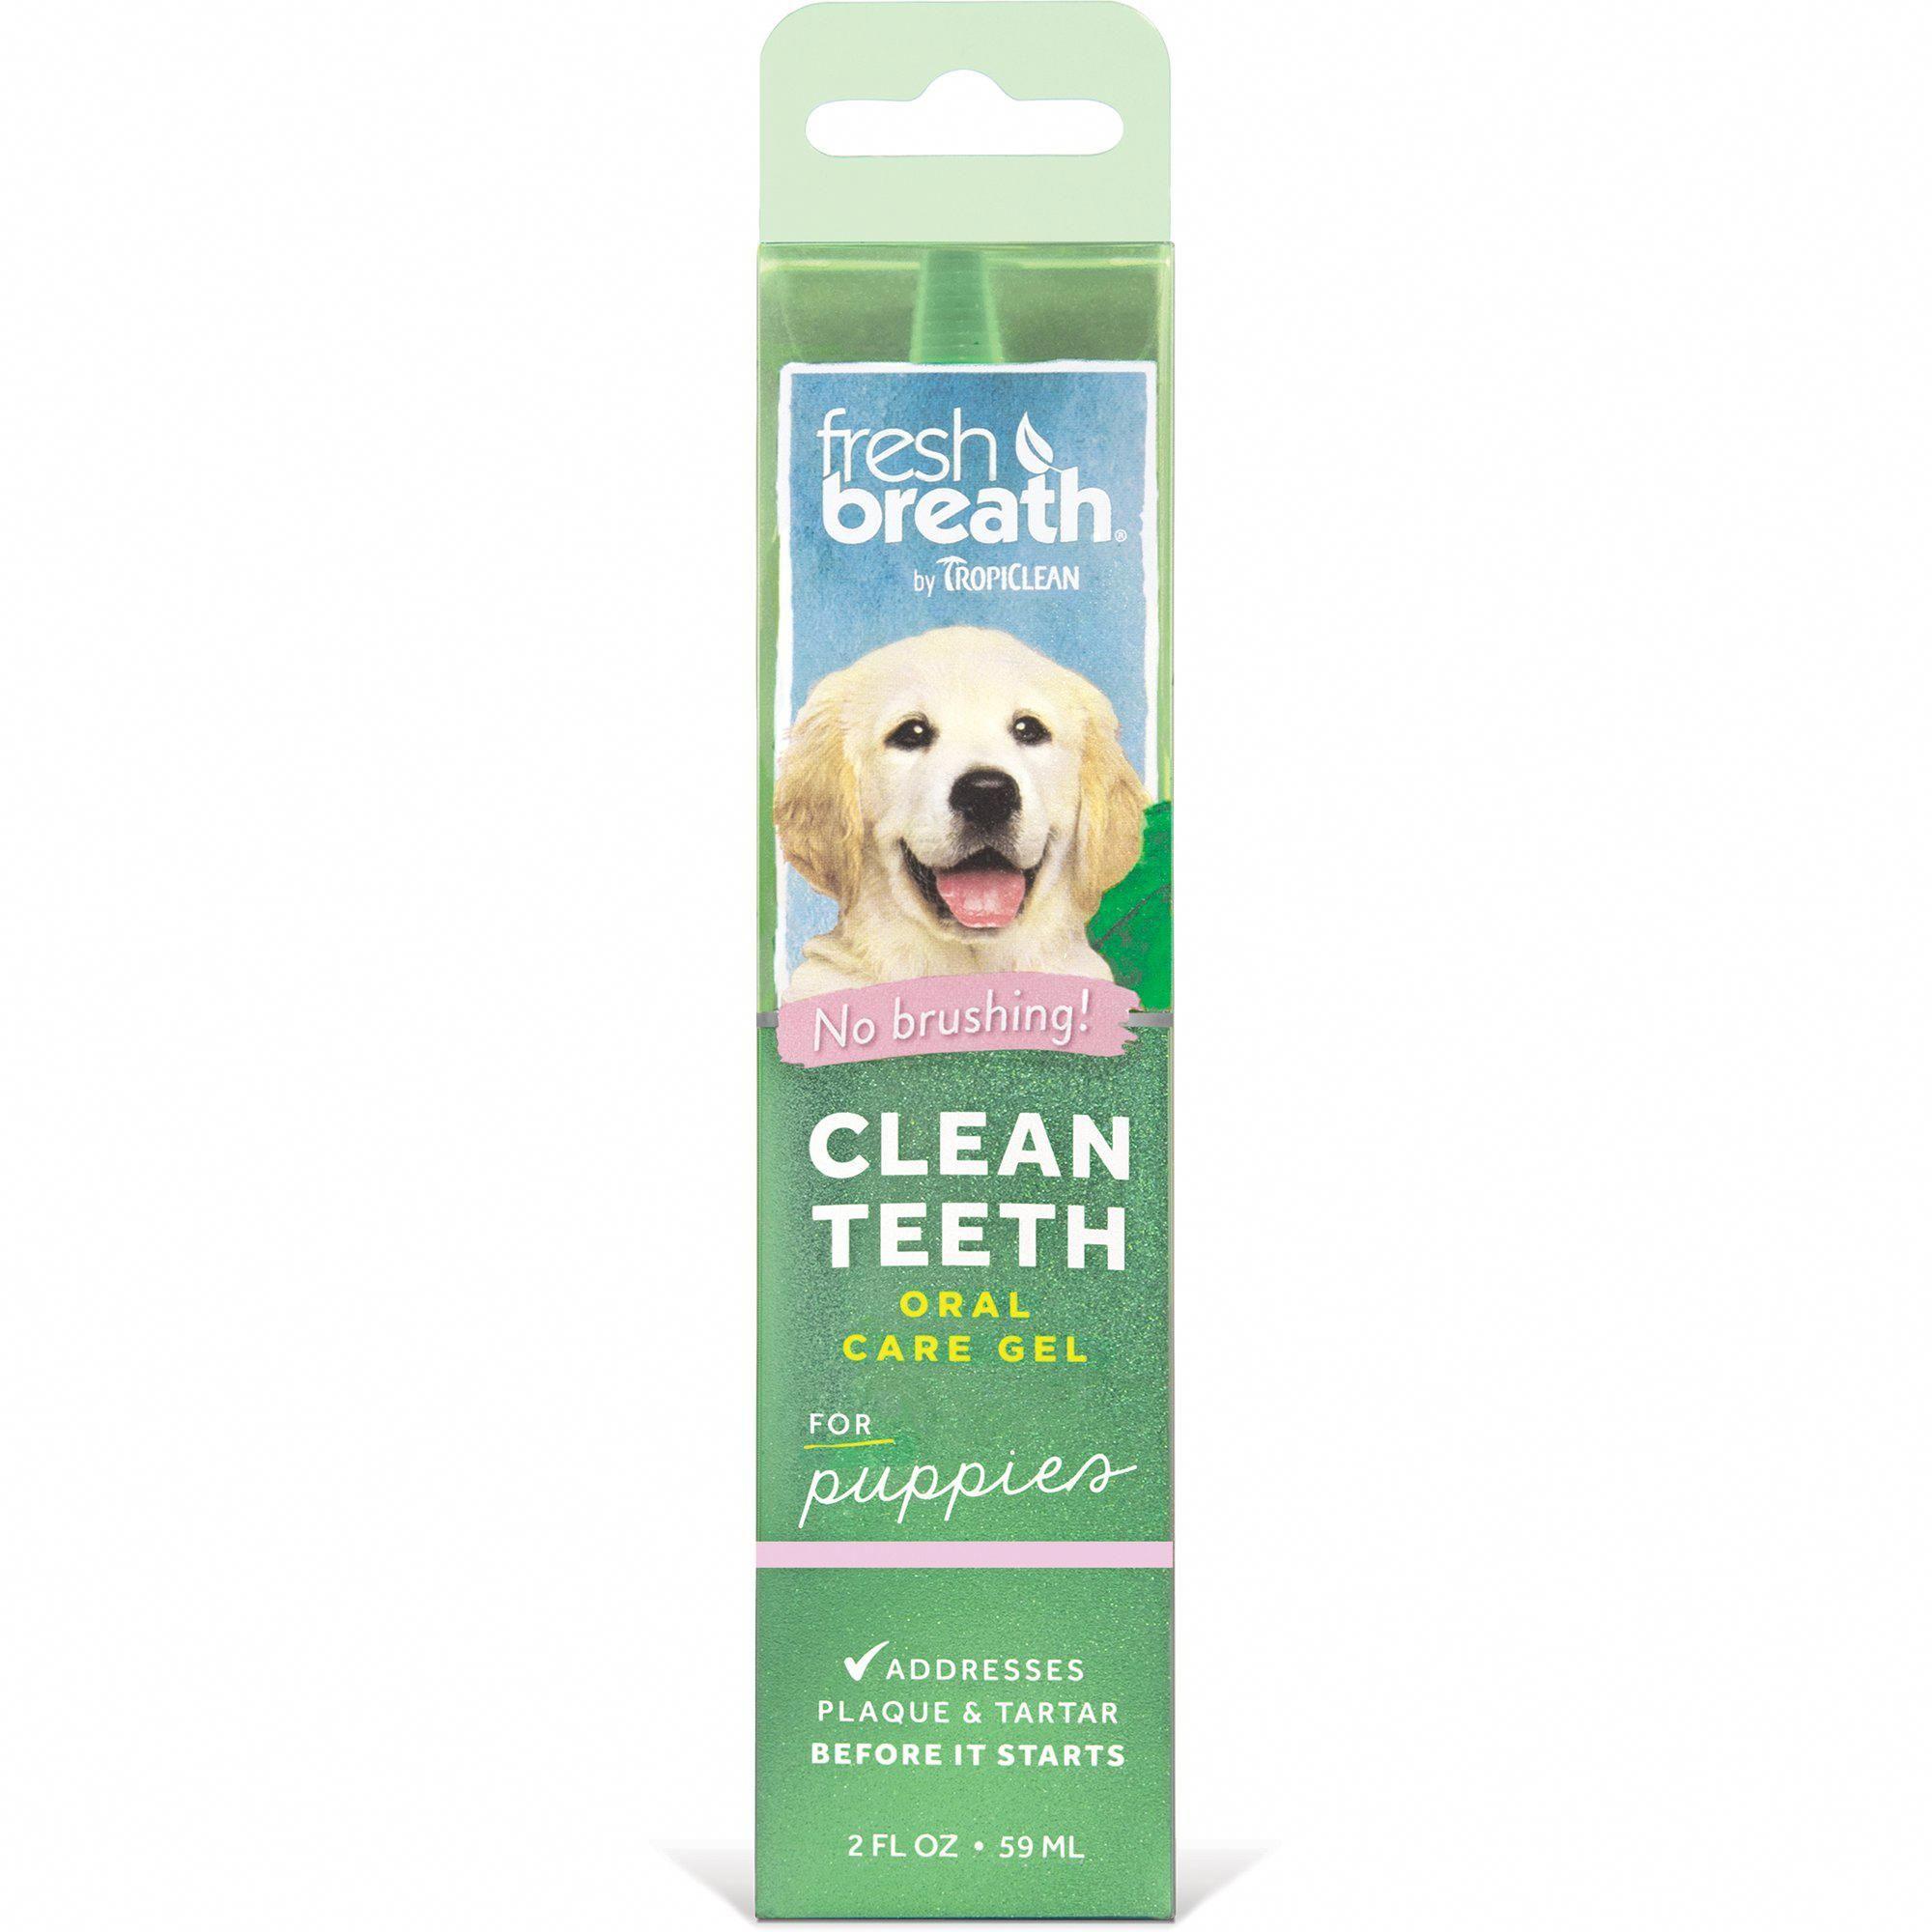 TropiClean Fresh Breath Clean Teeth Gel for Puppies | Petco #dentalcare